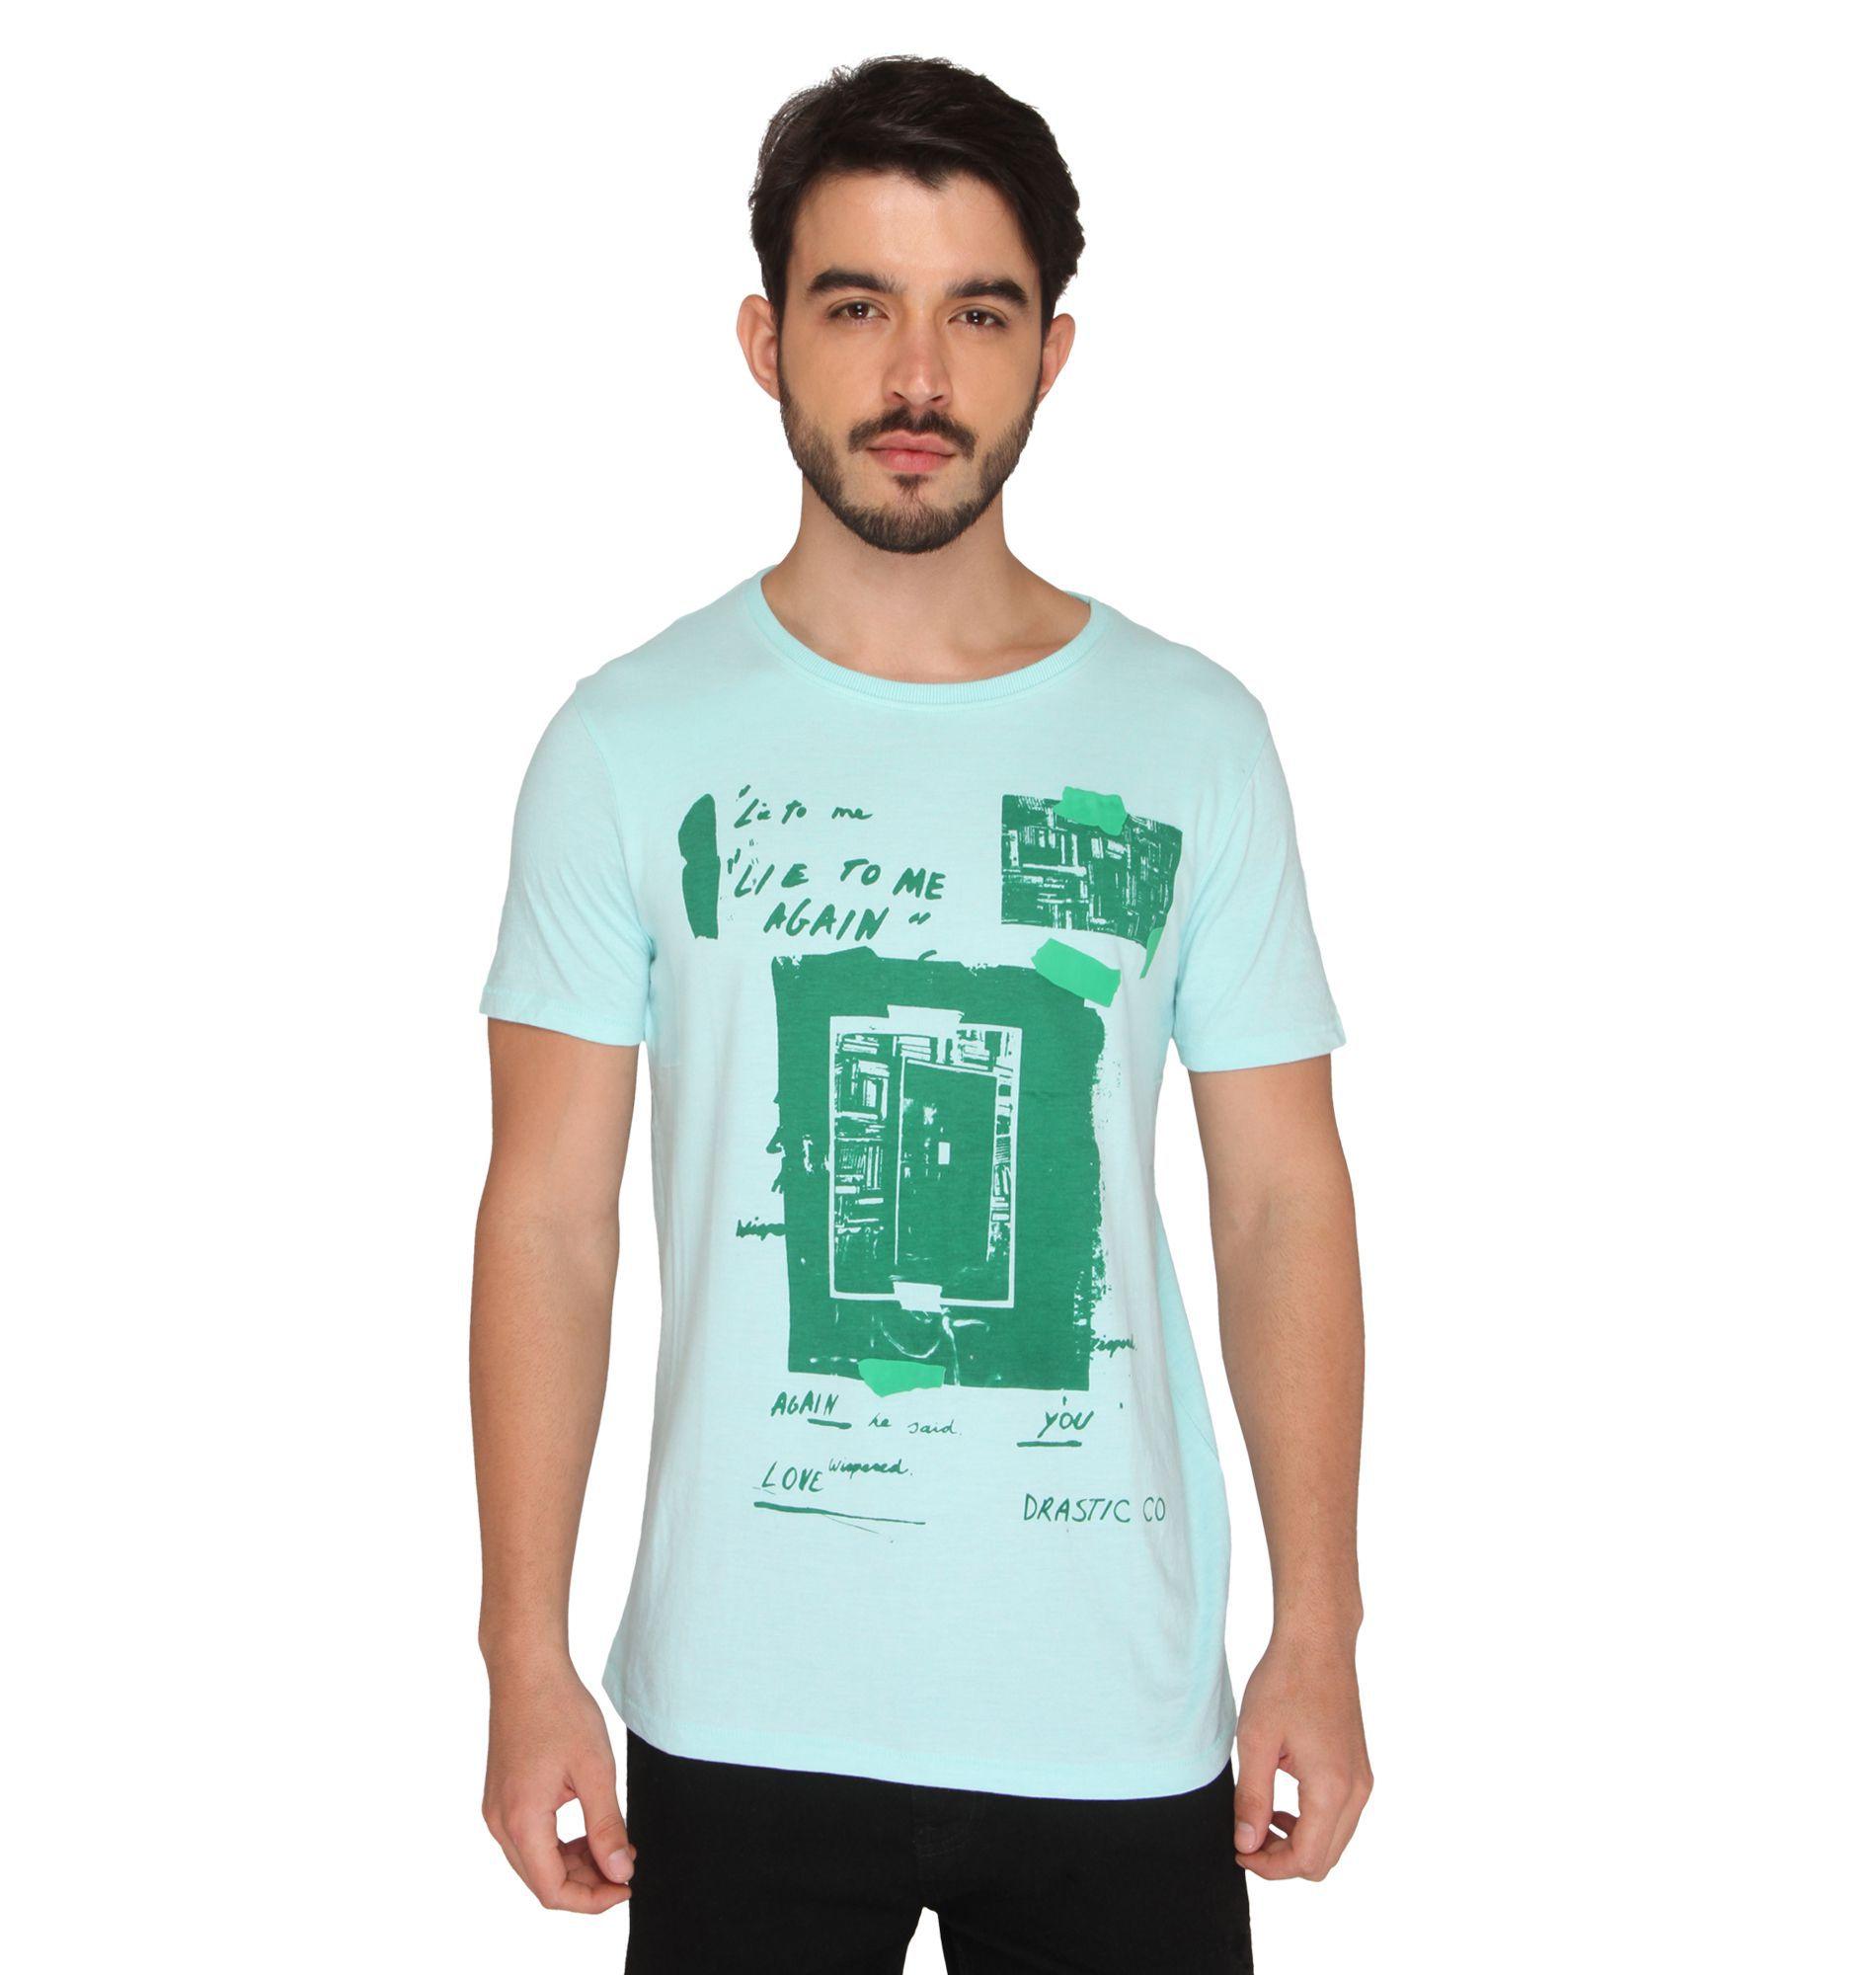 Drastic Green Round T-Shirt